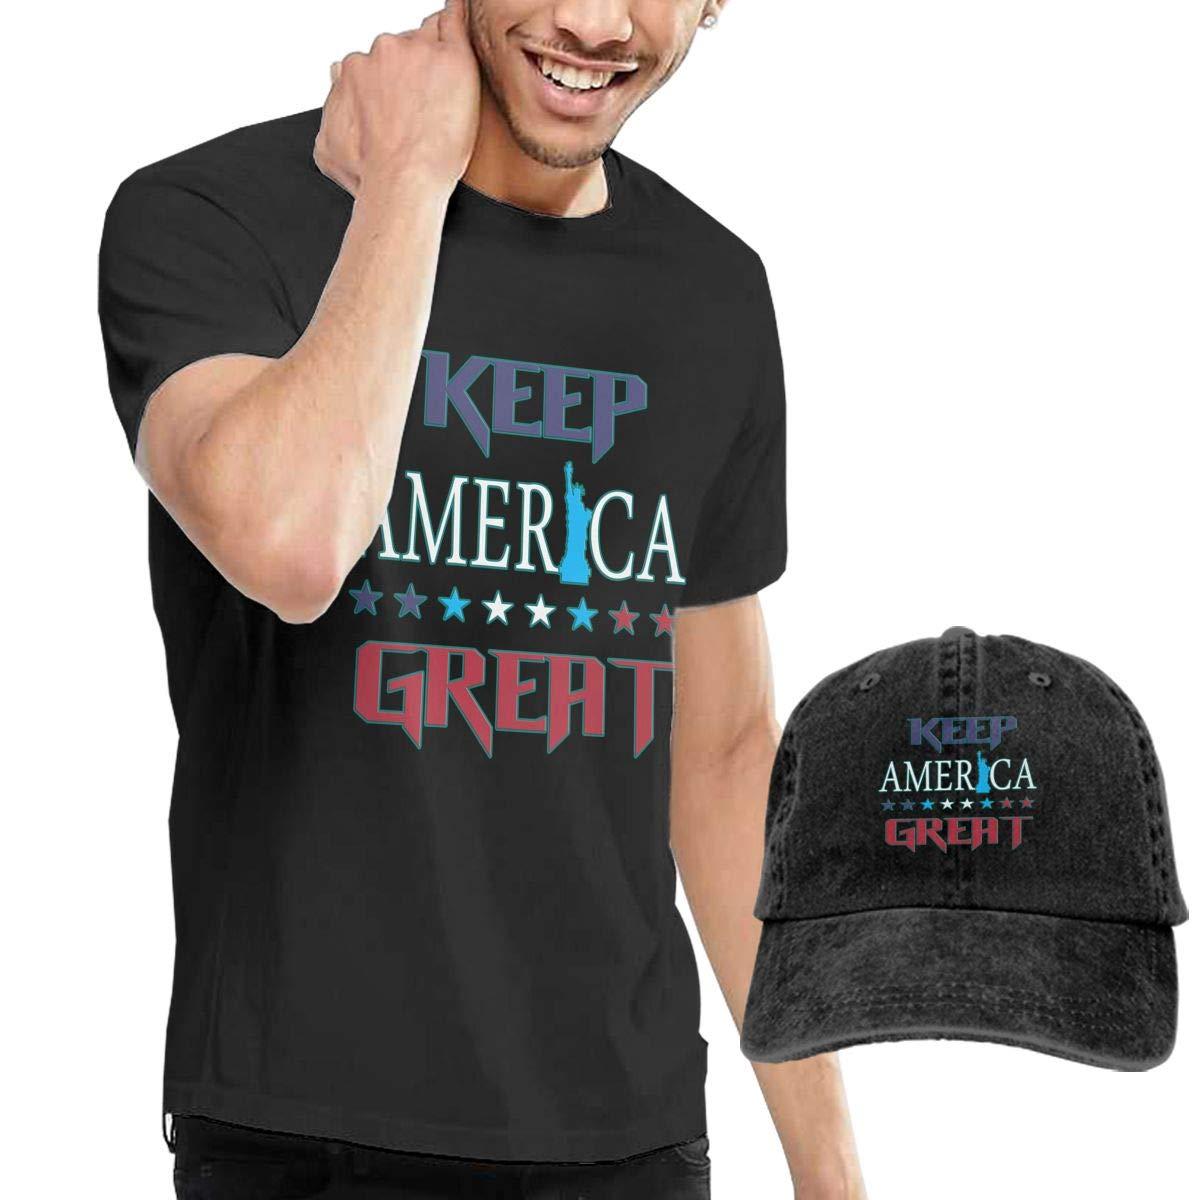 WWTBBJ-B Keep America Great Adult Mens Summer T-Shirts and Baseball Jean Hat